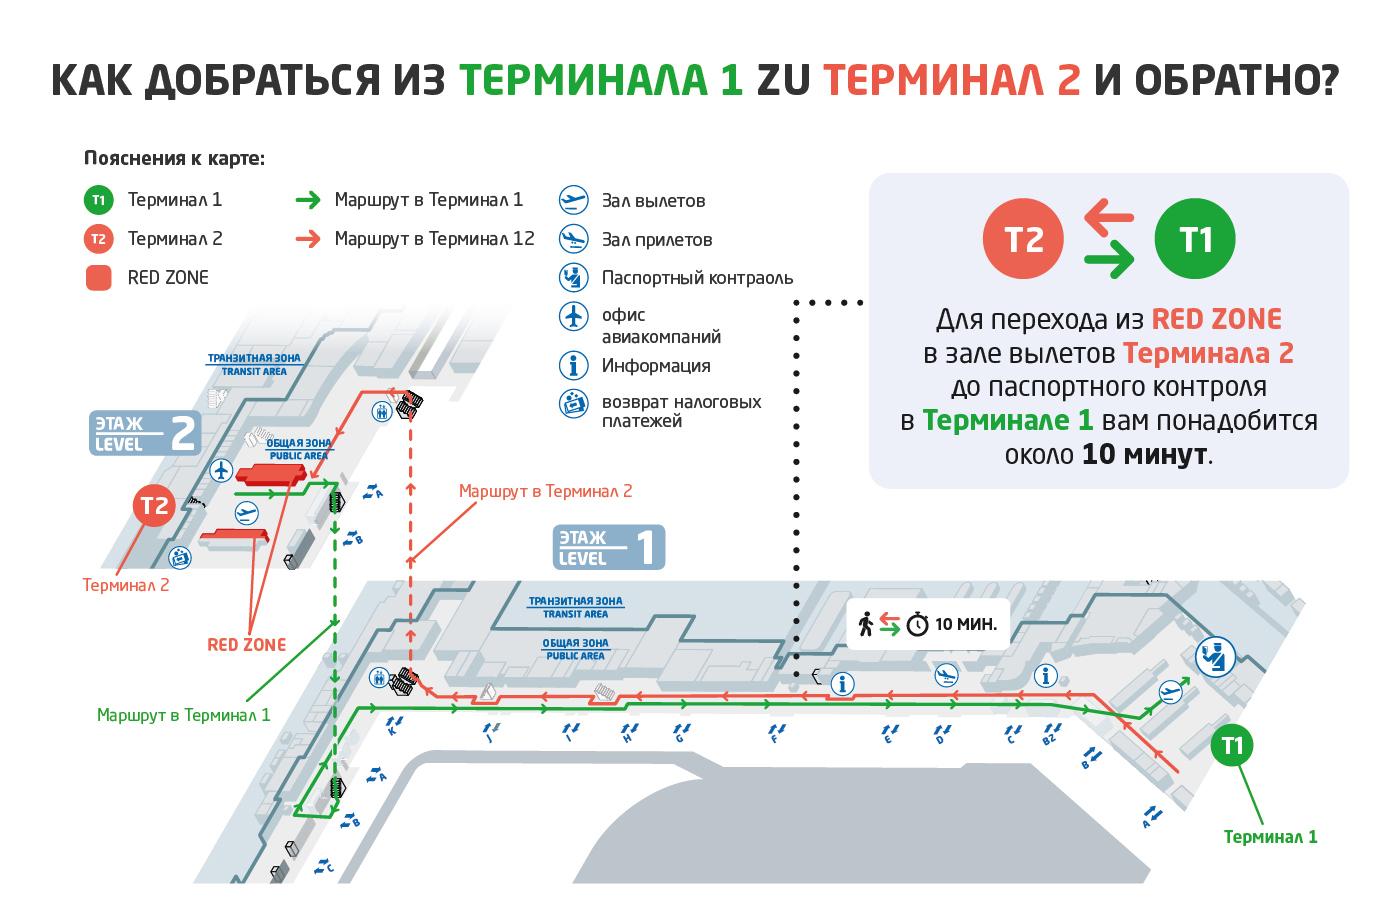 Прага аэропорт схема Т2-Т1